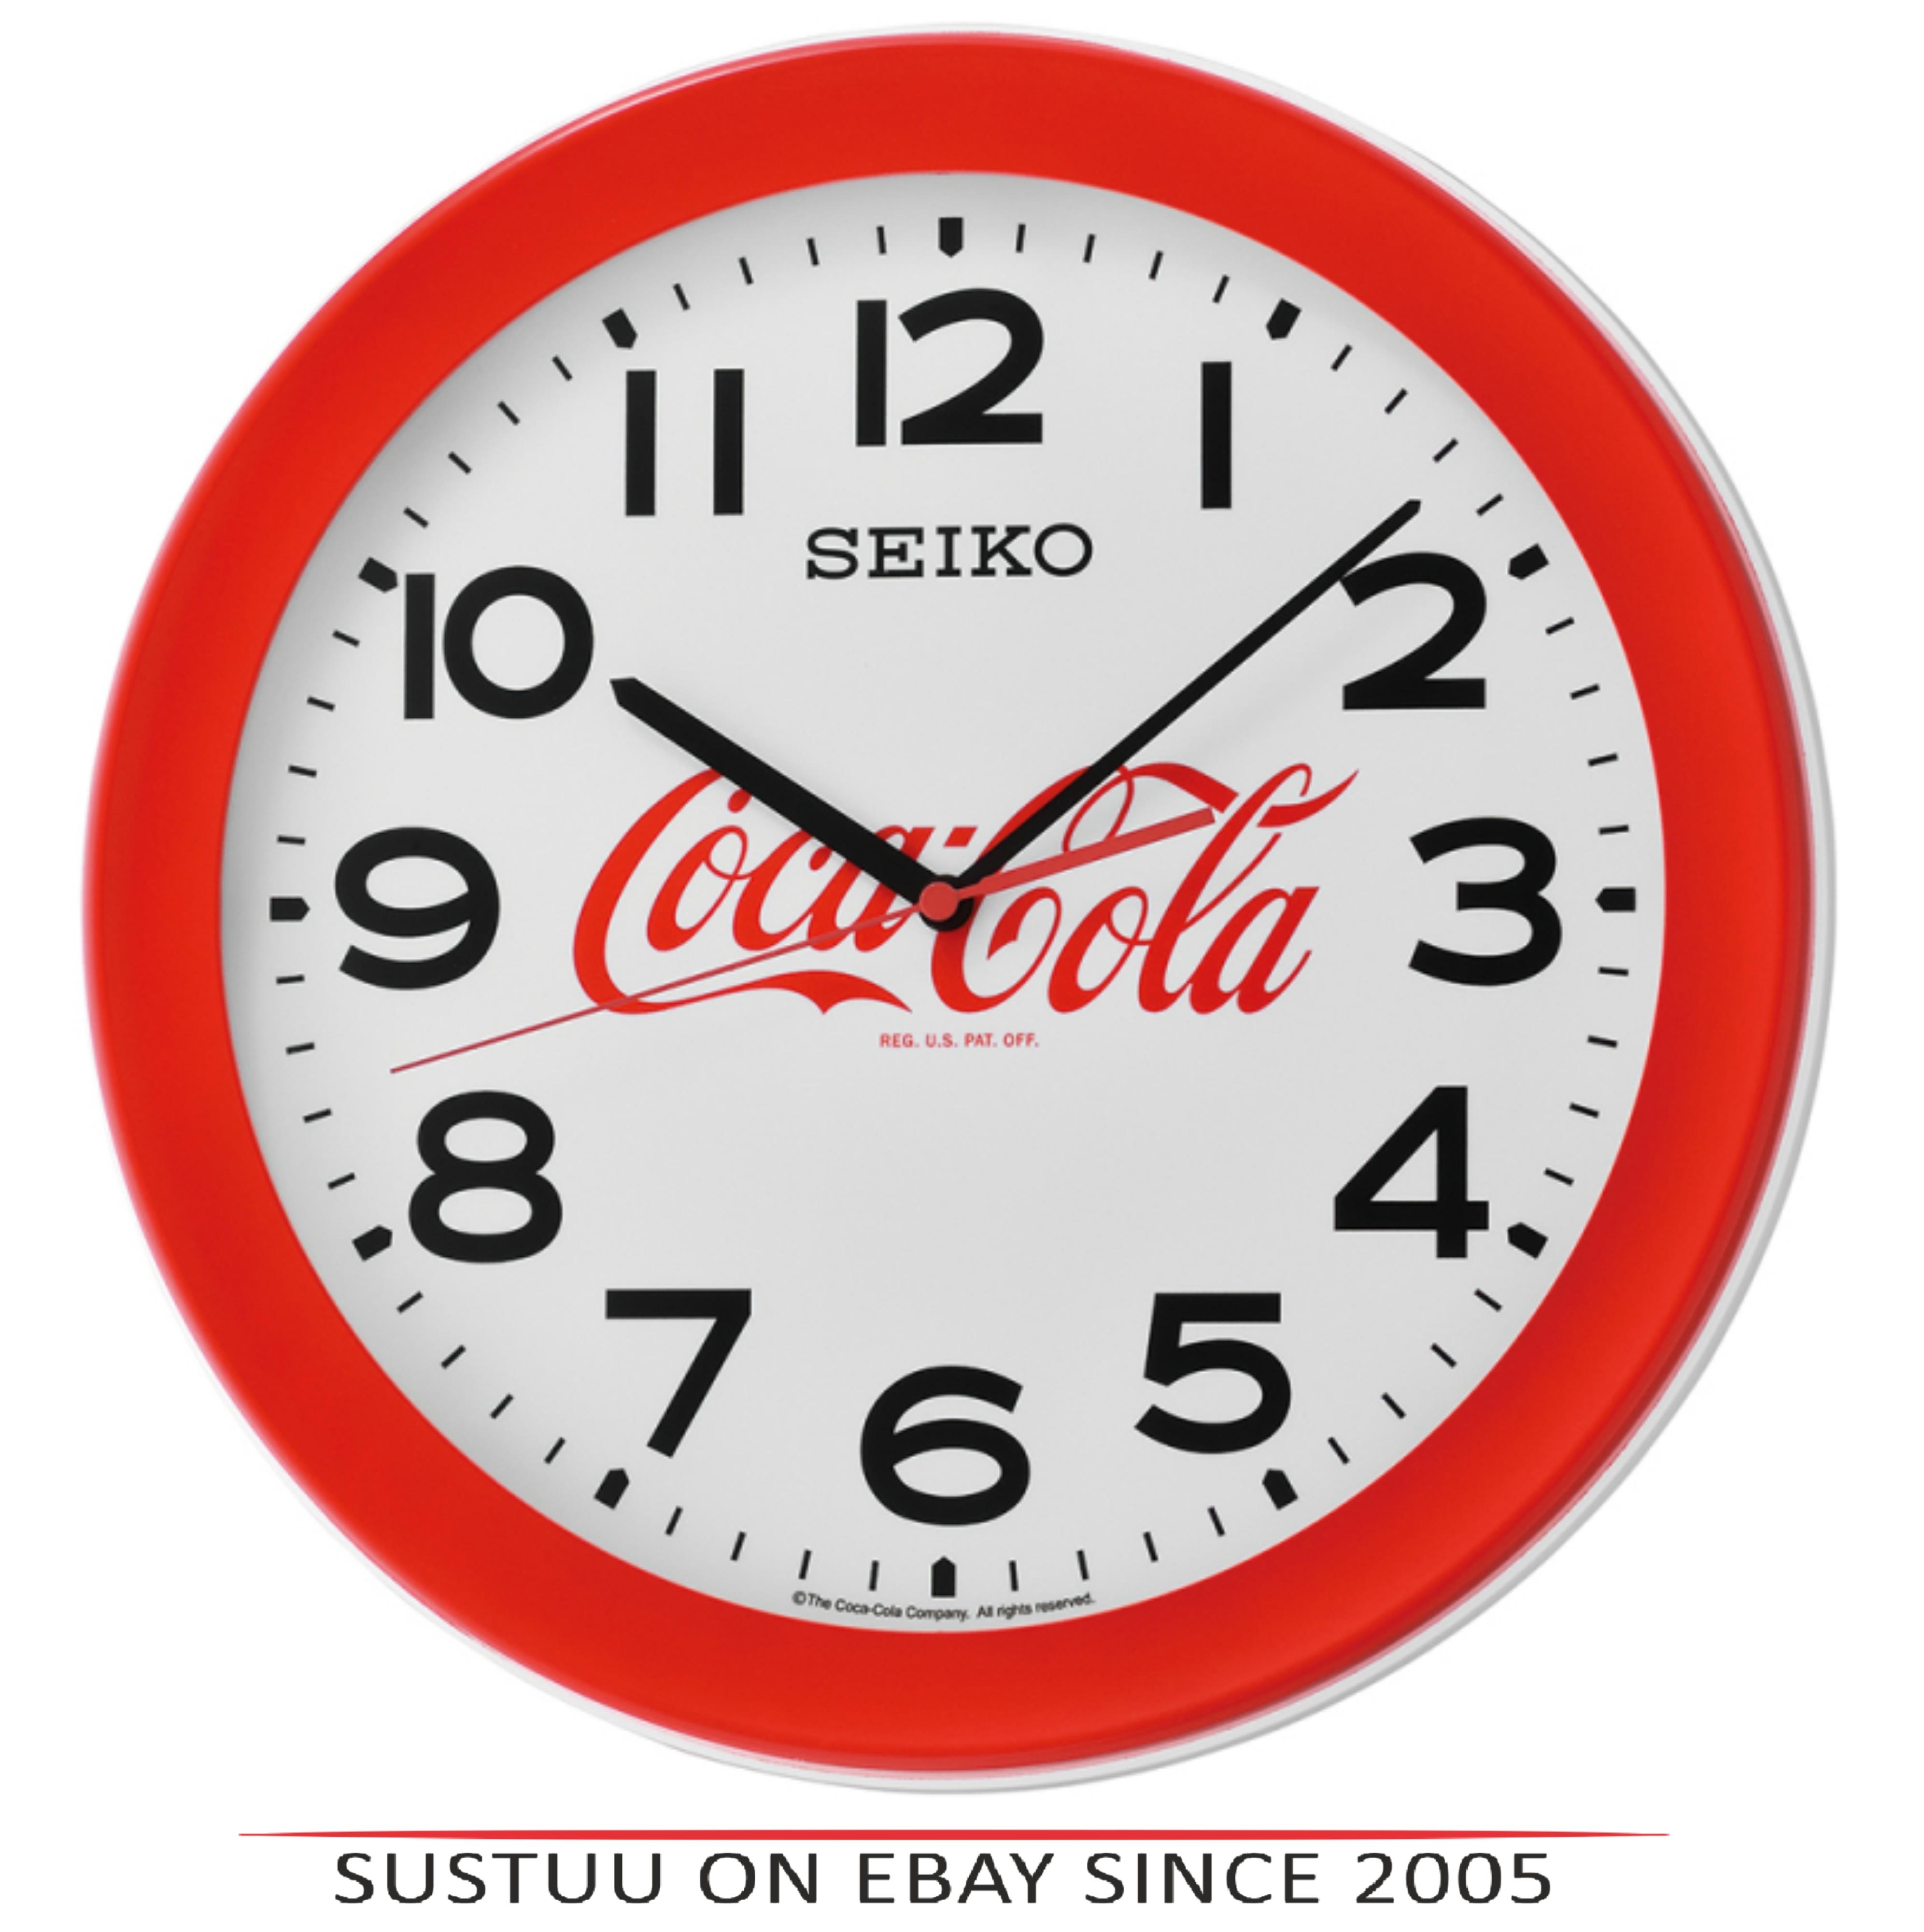 Seiko QXA922R Coca-Cola Wall Clock?Large Arabic Numerals?Round Shape?Plastic?Red